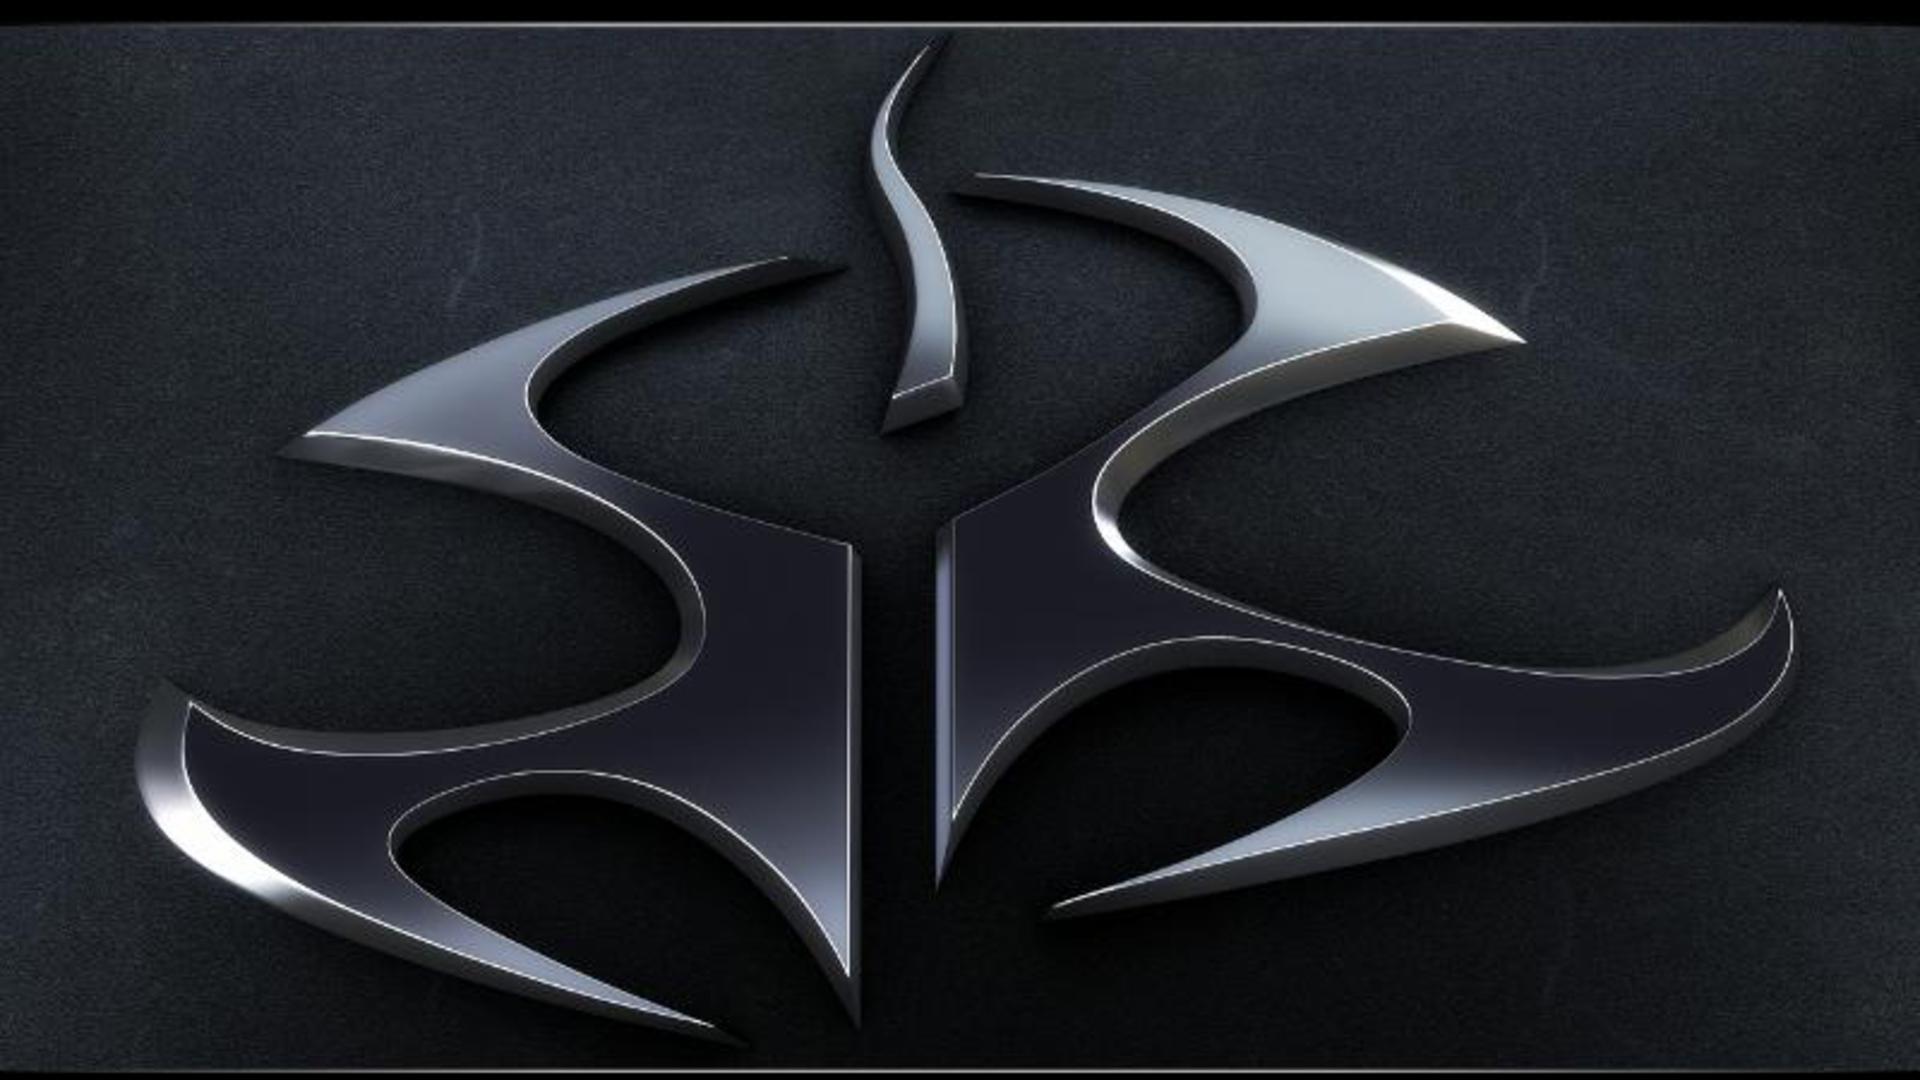 hitman logo wallpapers download